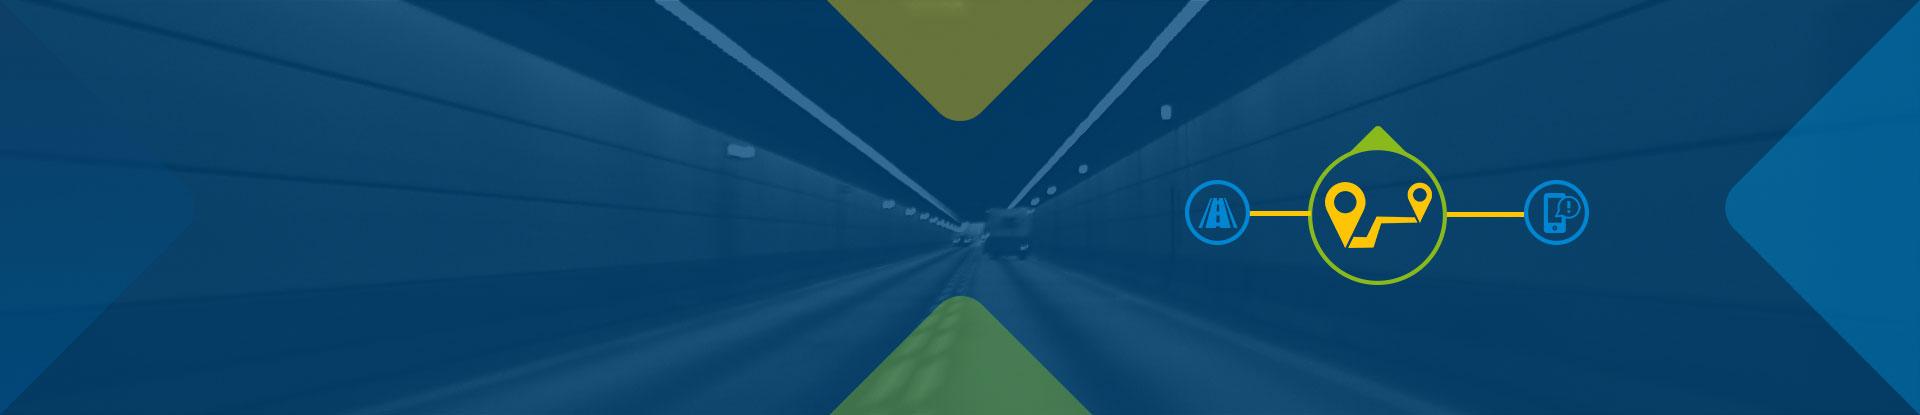 SynX Banner Drive Behavior